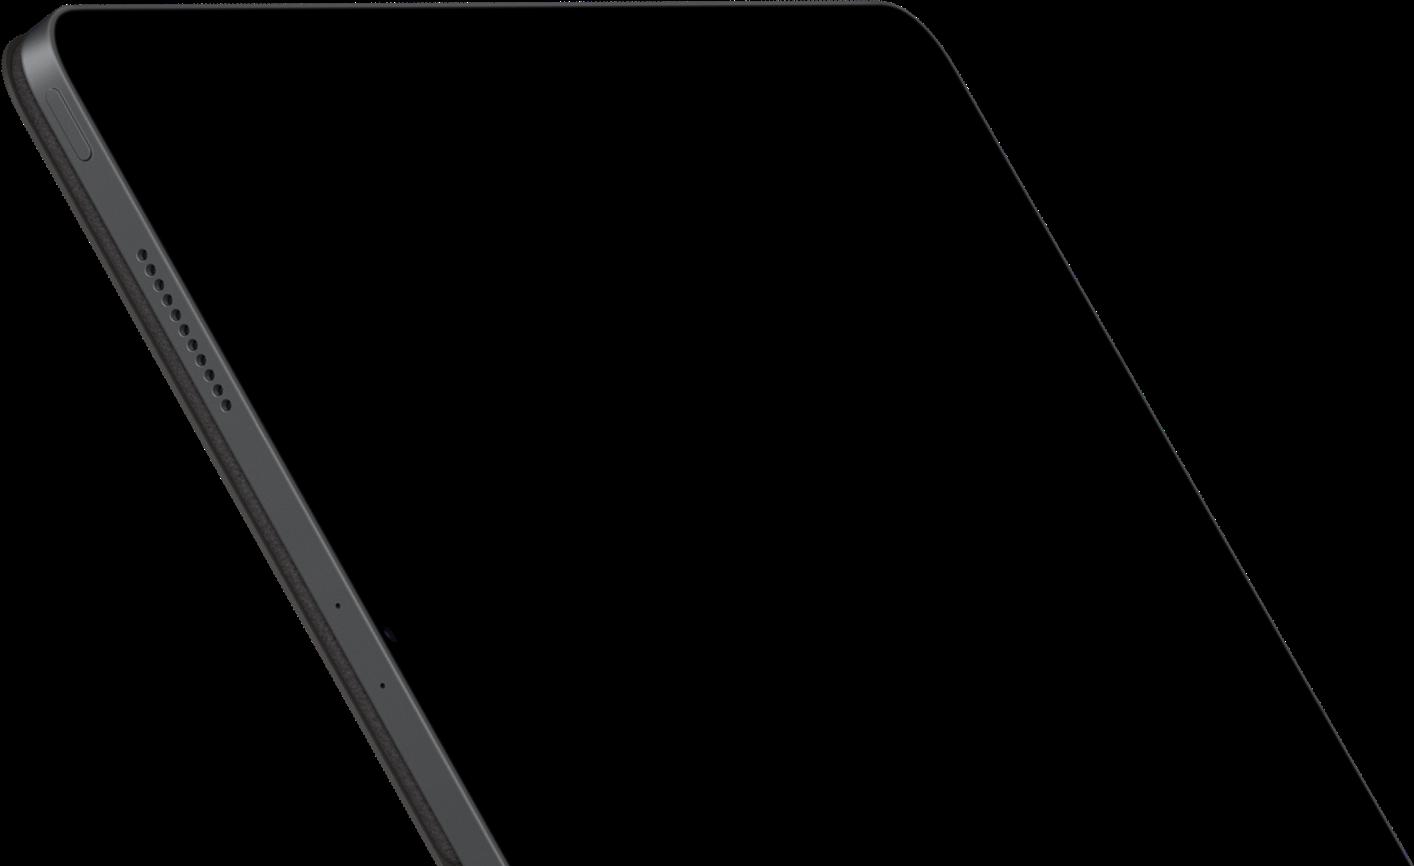 iPad-mockup